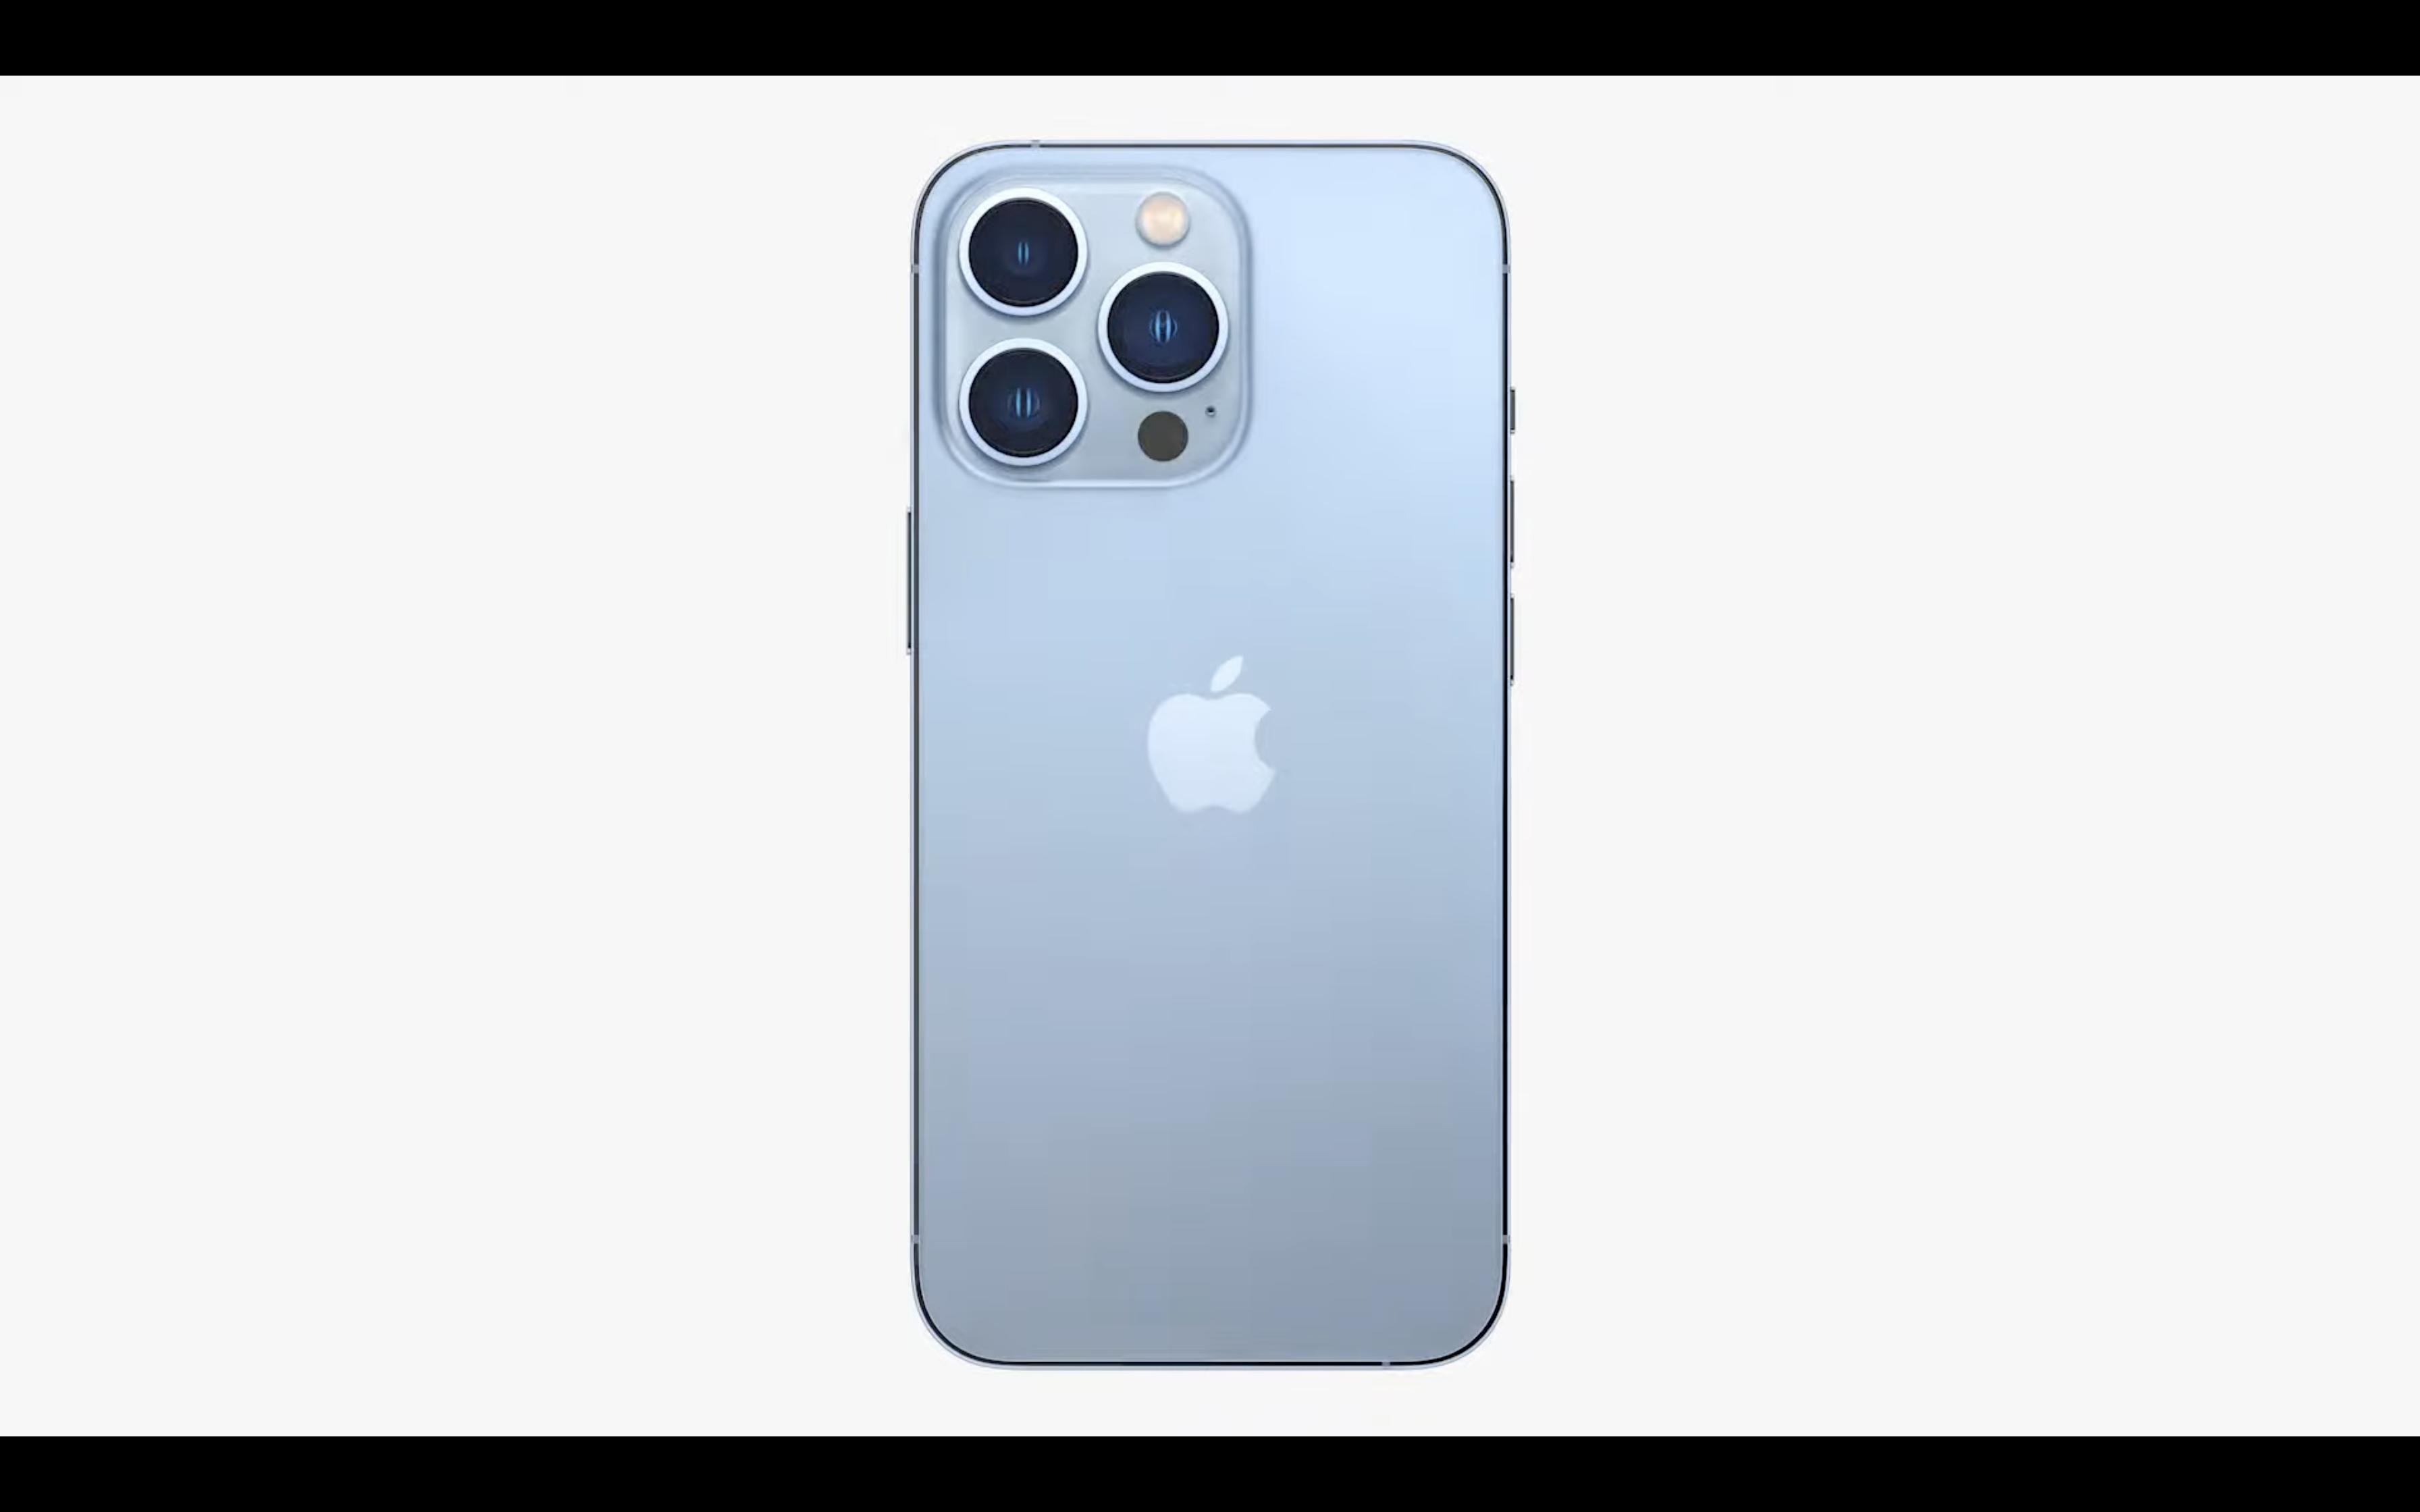 Apple iPhone 13 Pro Max規格、價錢與介紹 - ePrice.HK 流動版-0